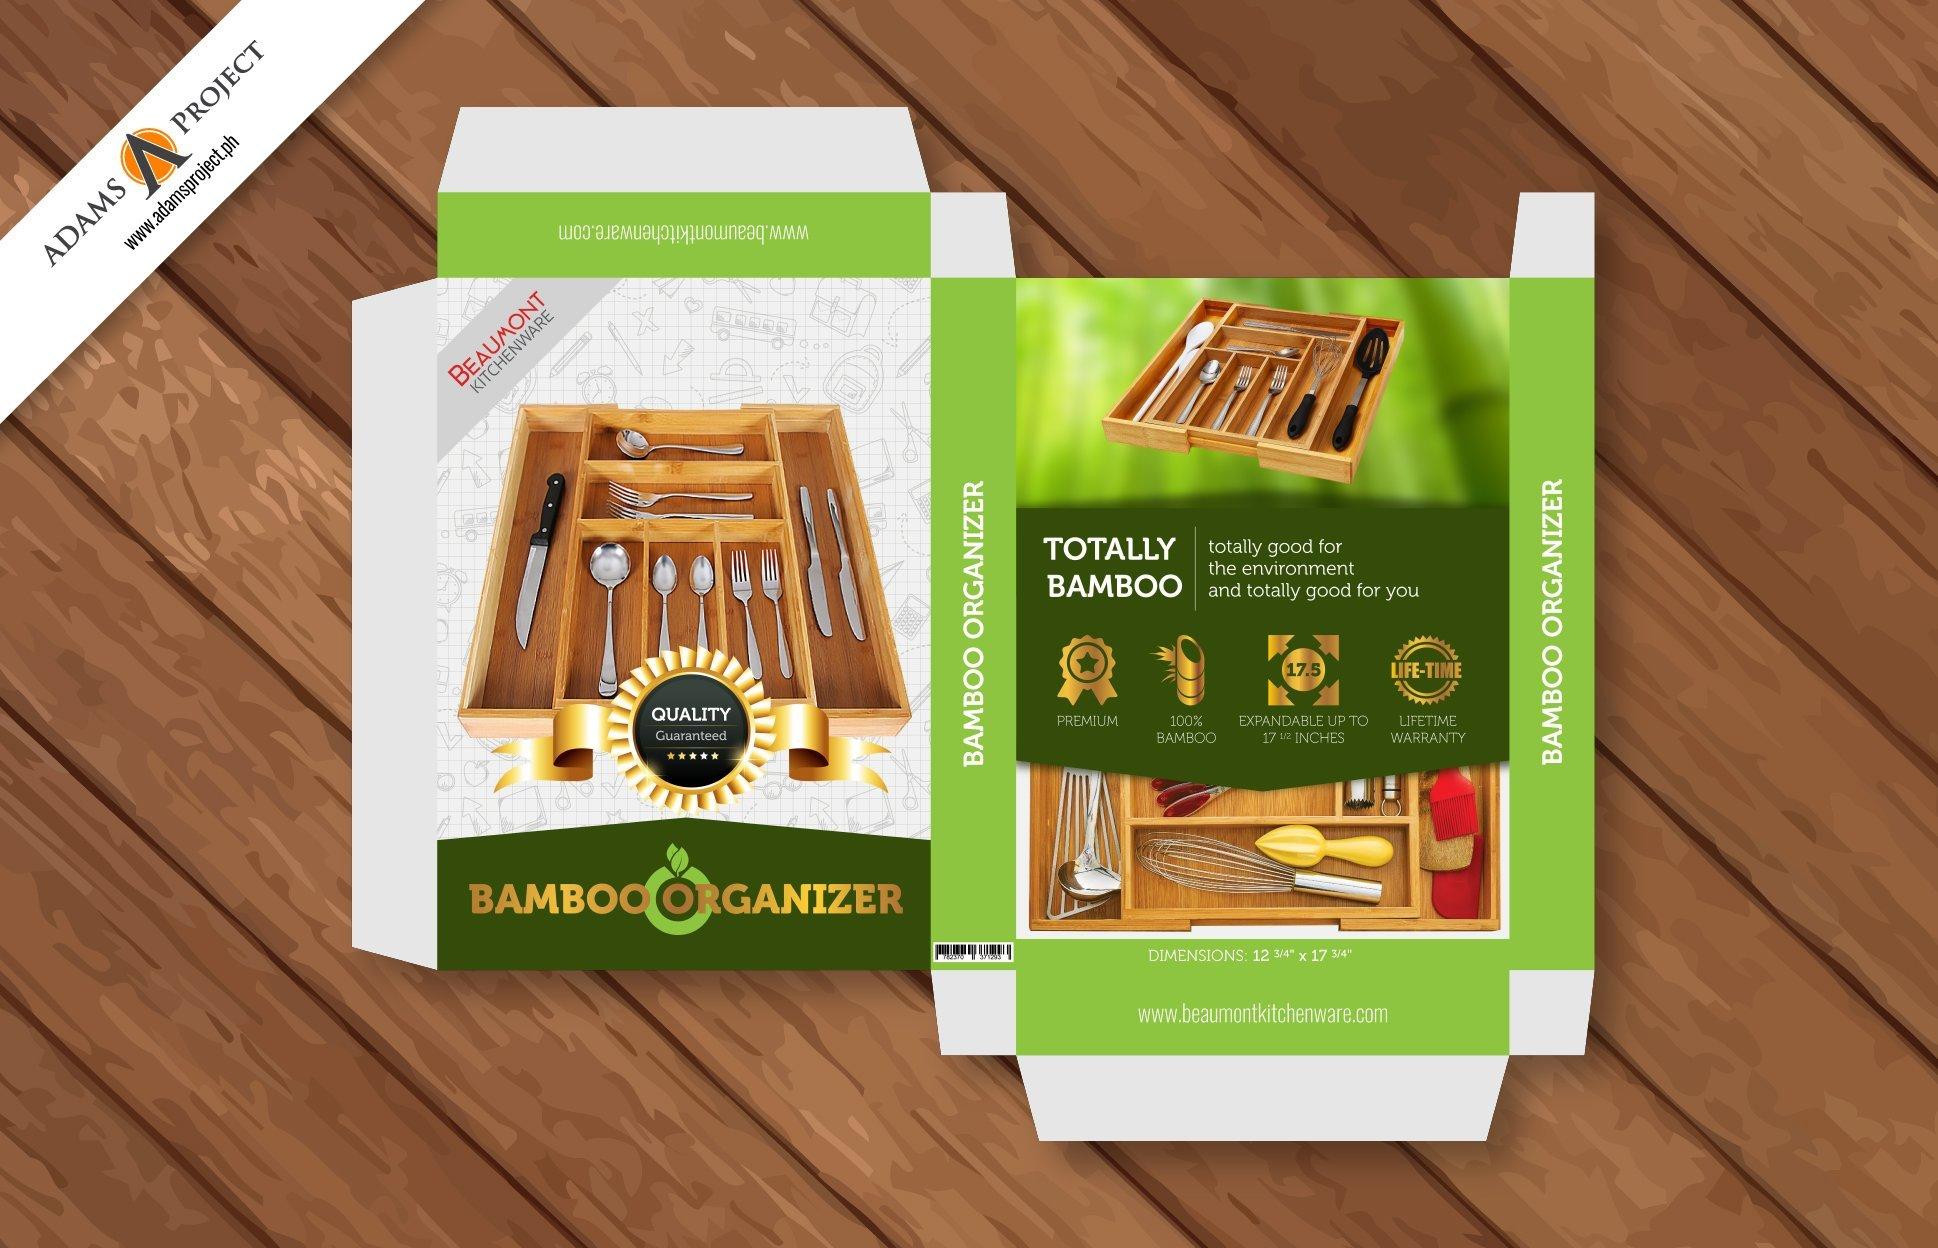 Bamboo-Organizer